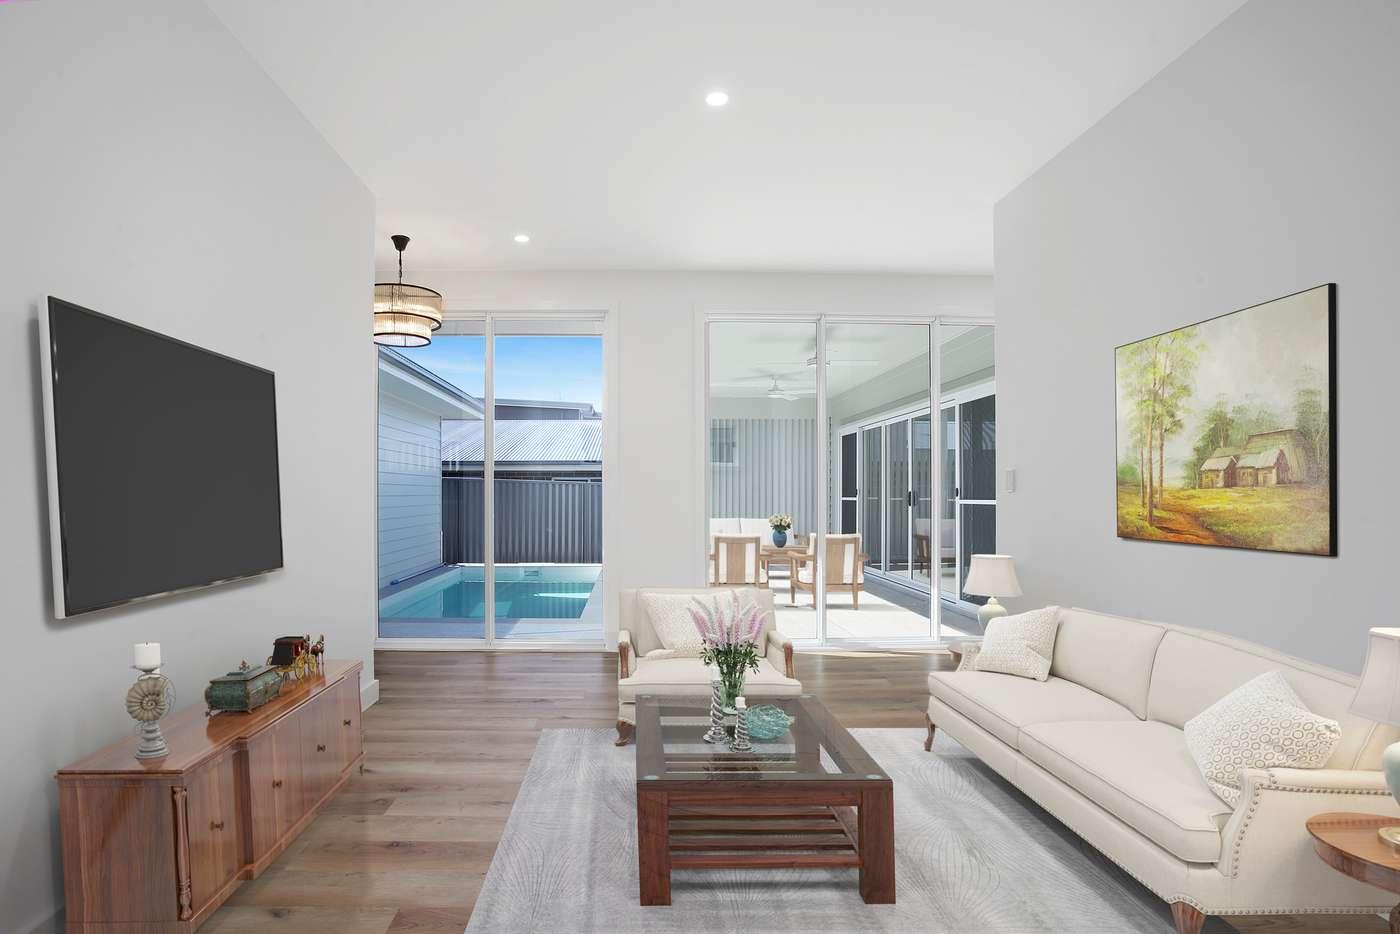 Sixth view of Homely house listing, 57 Saddleback Crescent, Kembla Grange NSW 2526